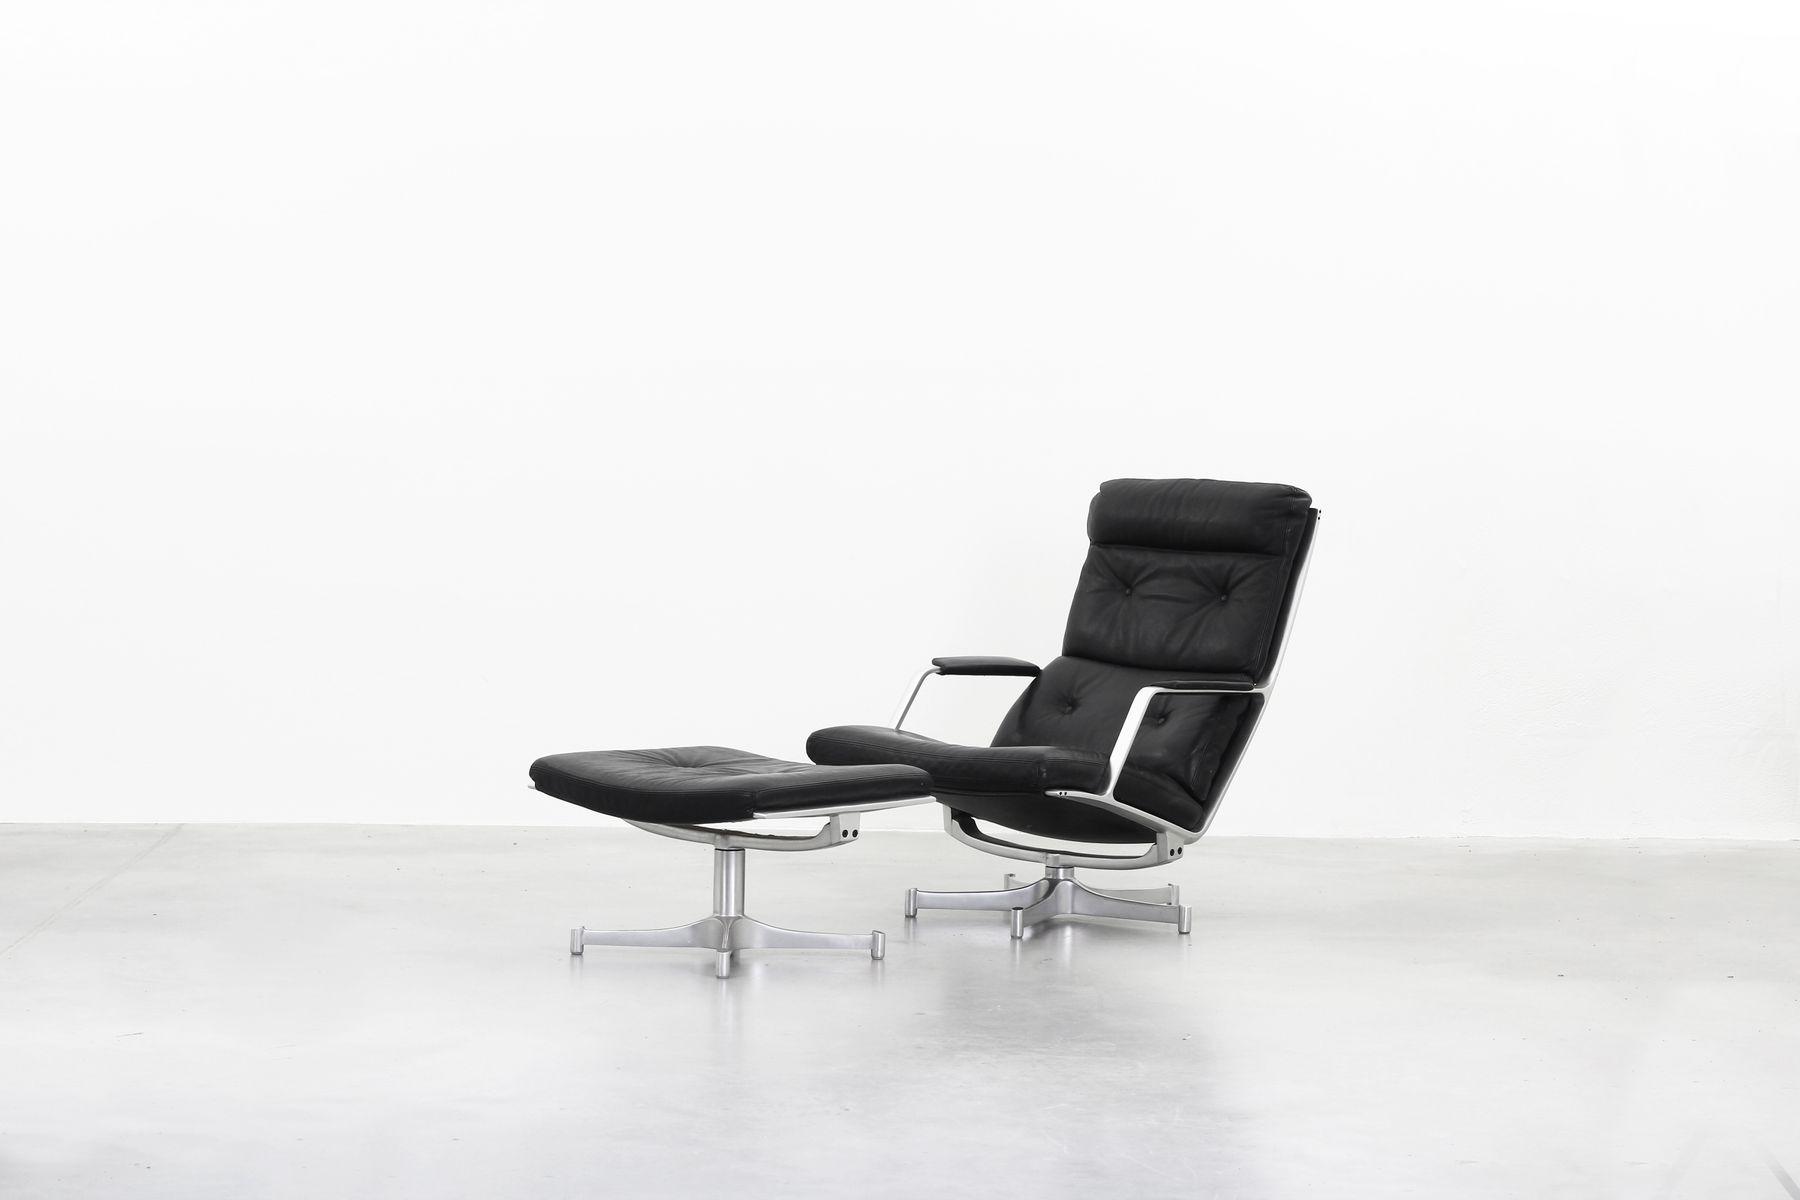 fk85 sessel hocker von fabricius kastholm f r kill international 1968 bei pamono kaufen. Black Bedroom Furniture Sets. Home Design Ideas